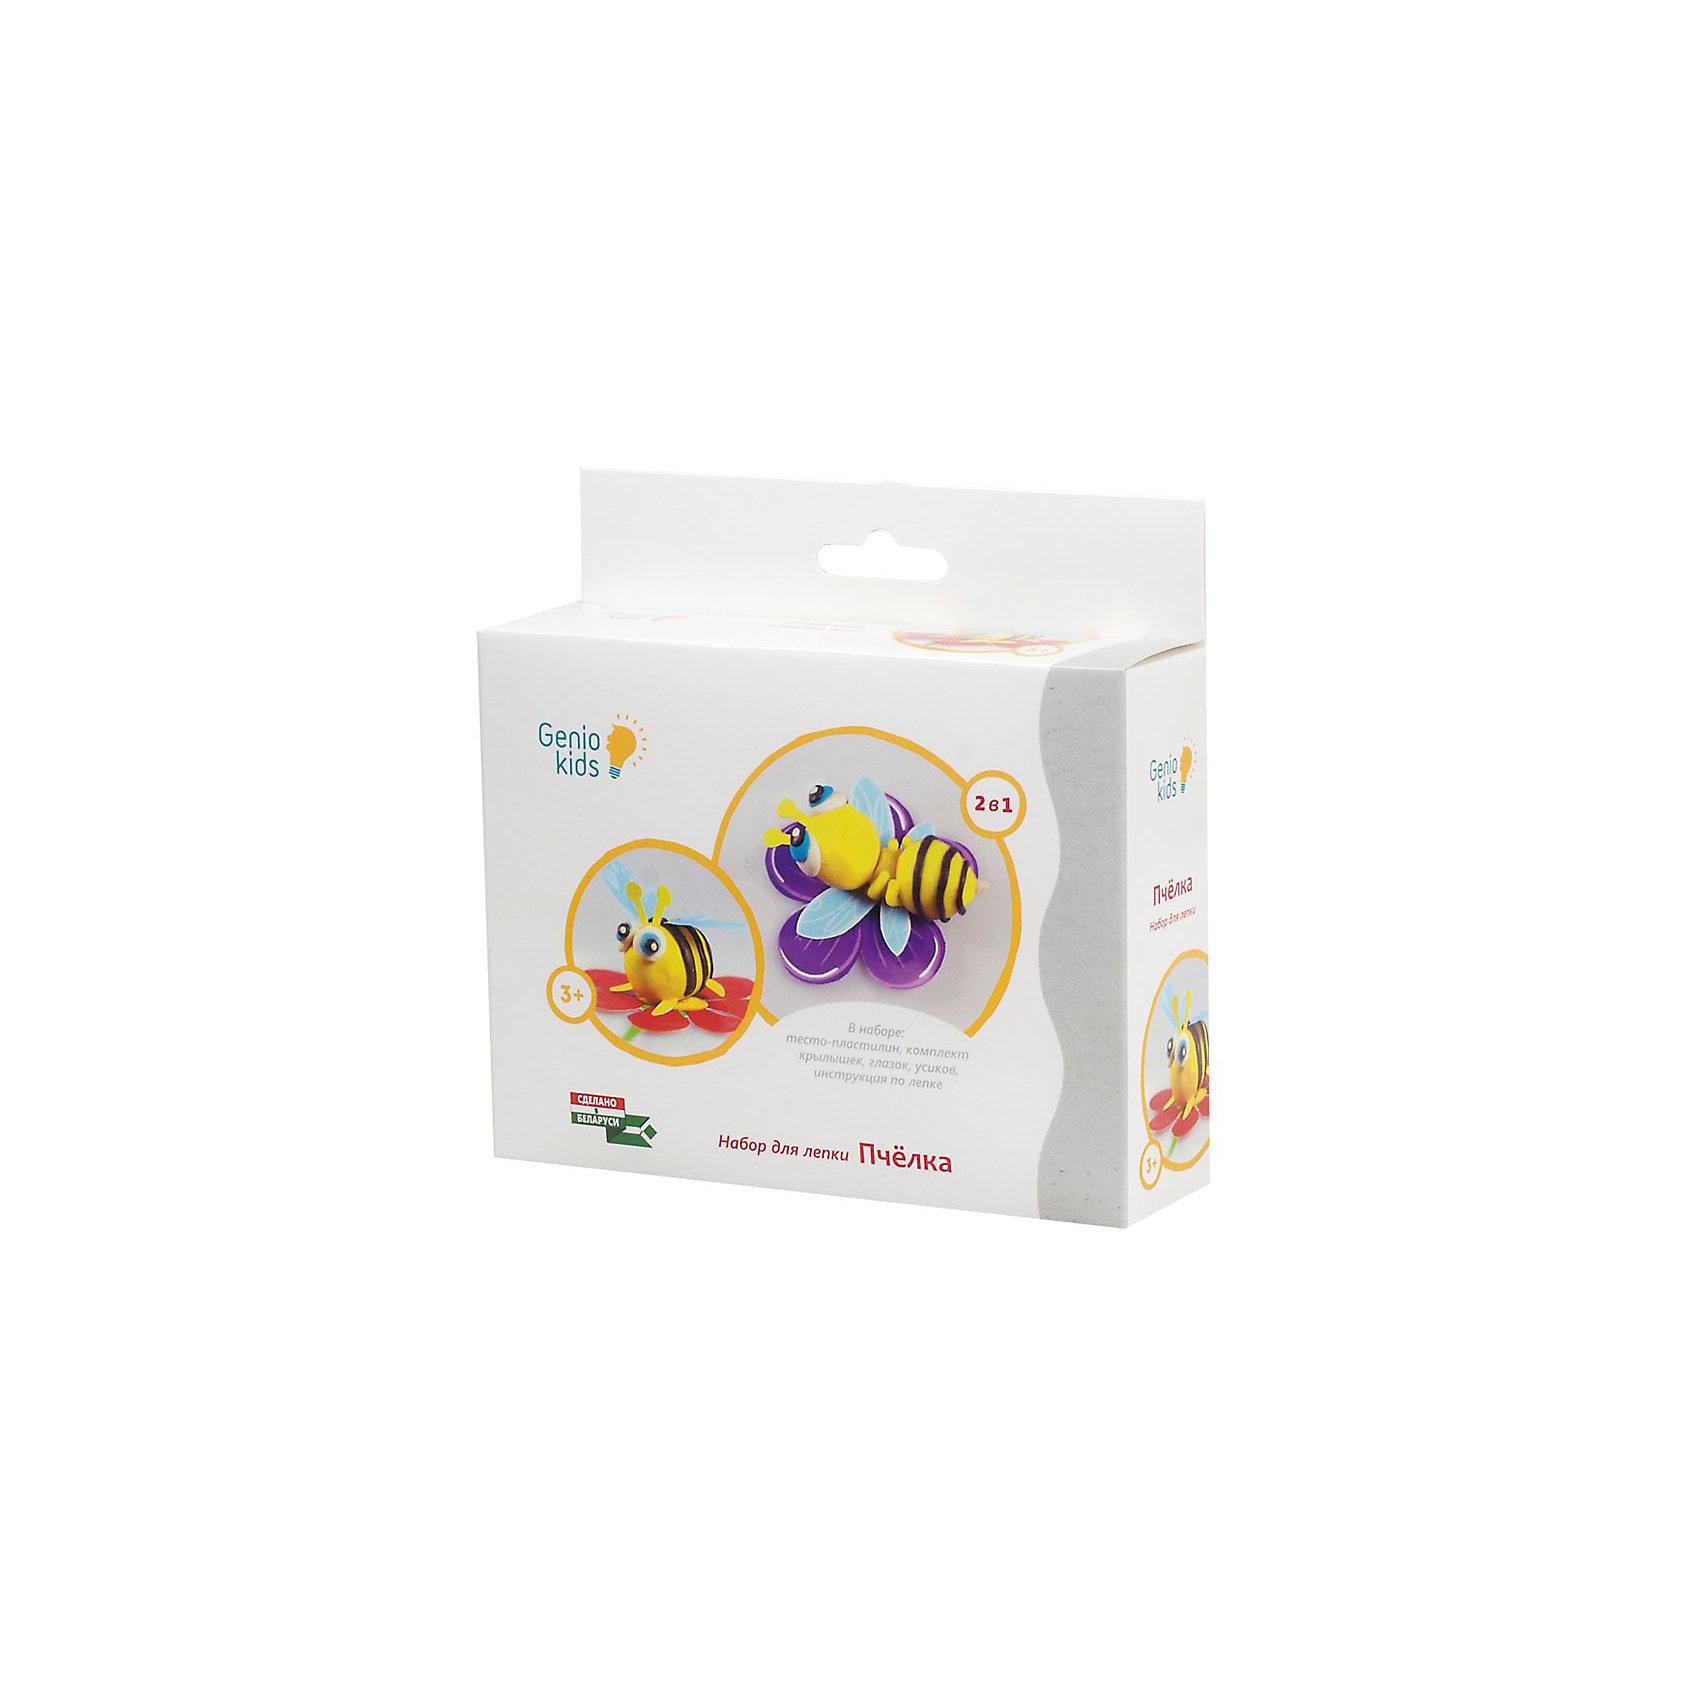 "Genio Kids Набор для детского творчества Пчёлка genio kids набор для детского творчества ""шкатулка"""